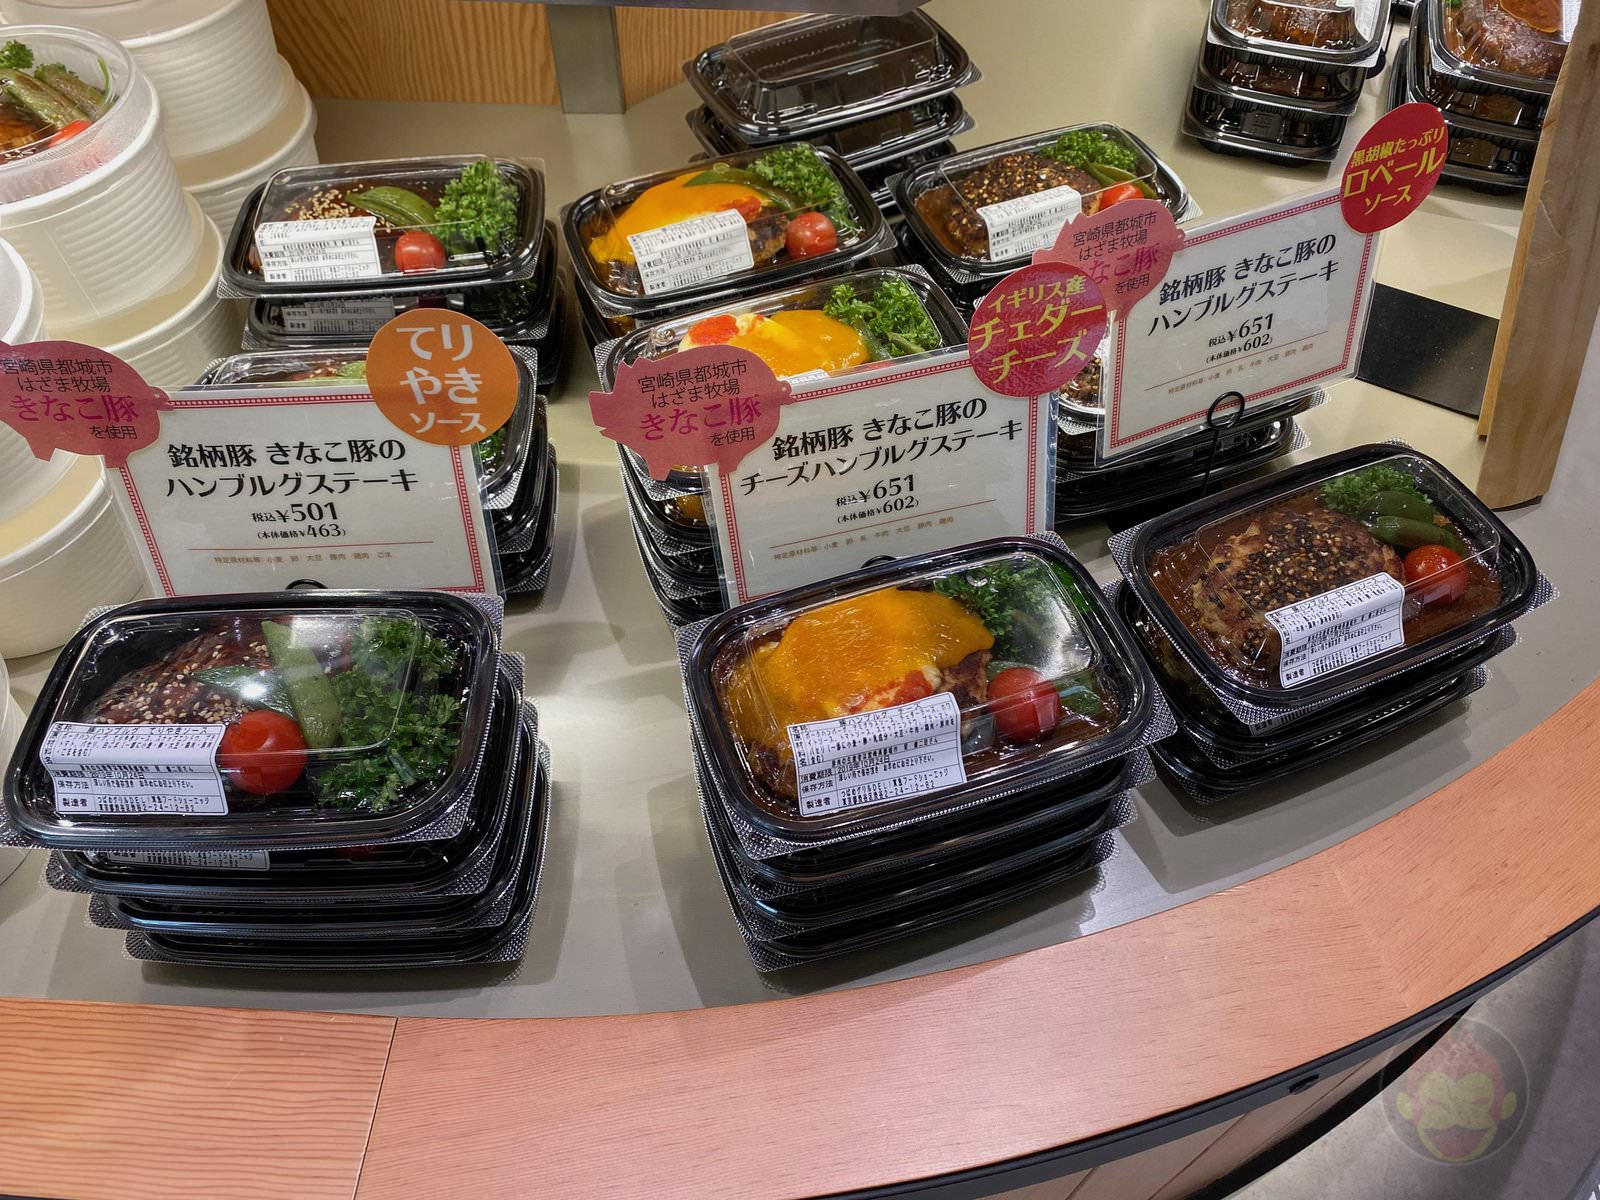 Shibuya-Scramble-Square-Food-I-Ate-144.jpeg